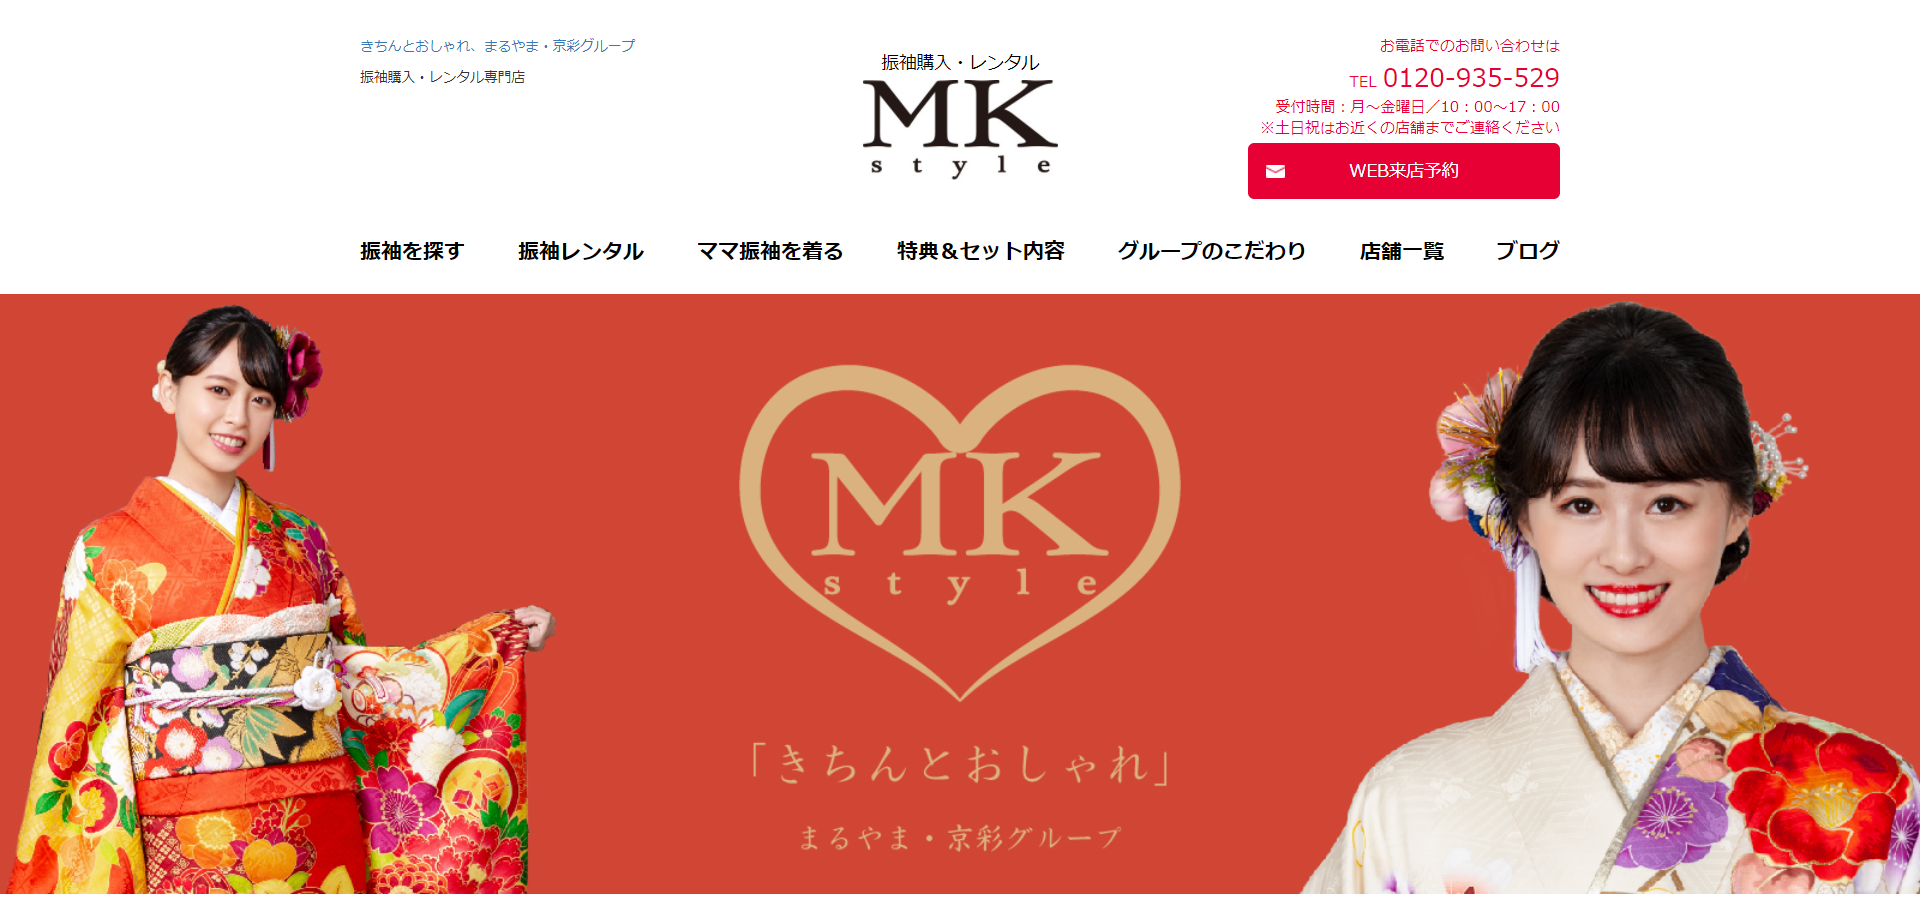 MK style 町田駅前店